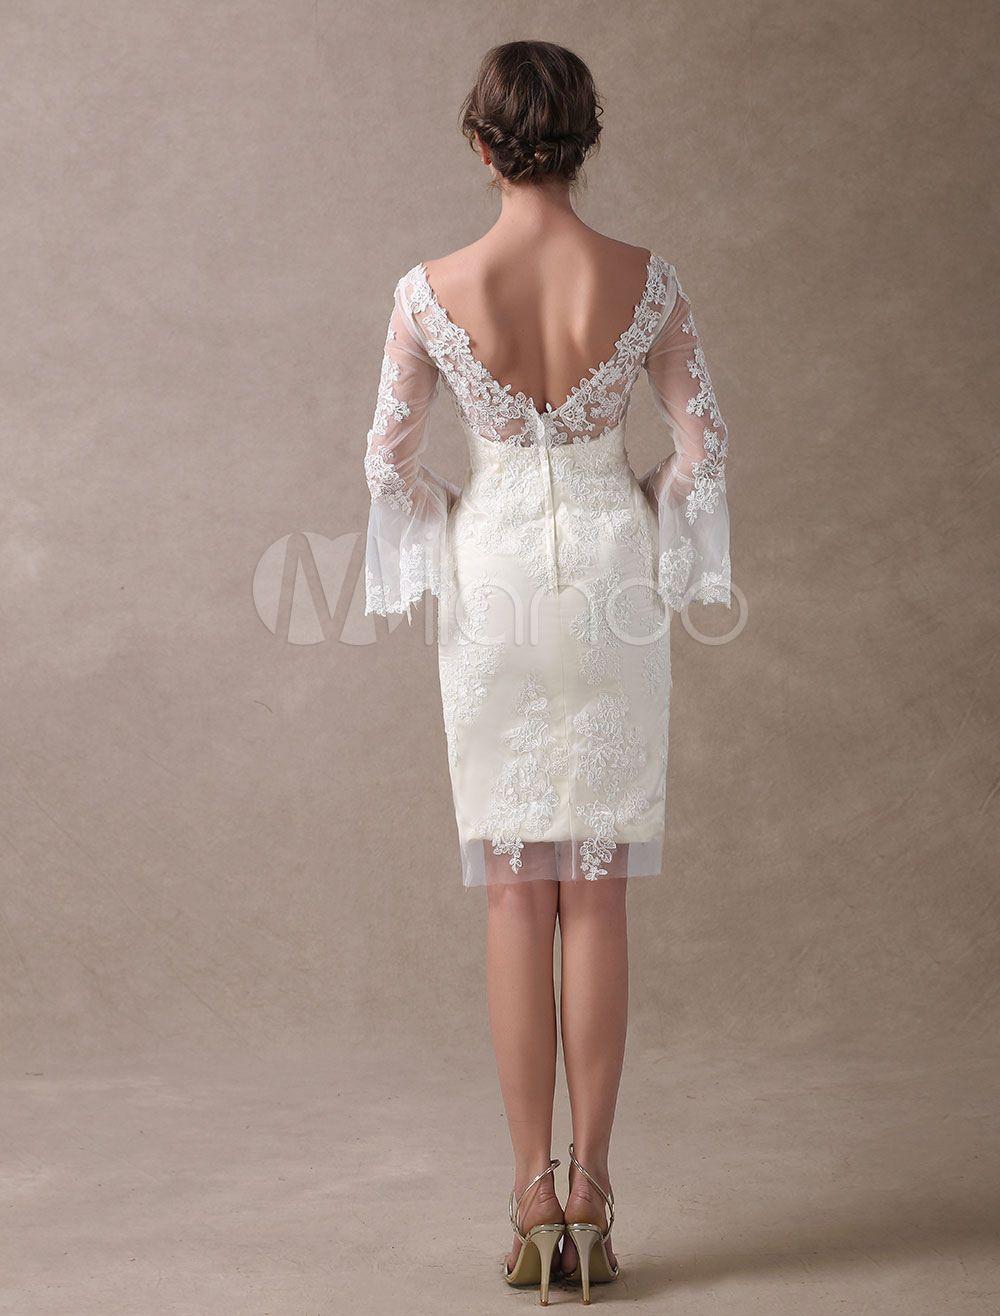 Boho Wedding Dresses Short Sheath Beach Bridal Dress Bell Sleeve Lace Applique V Neck Knee L Short Wedding Dress Summer Wedding Gowns Knee Length Wedding Dress [ 1316 x 1000 Pixel ]